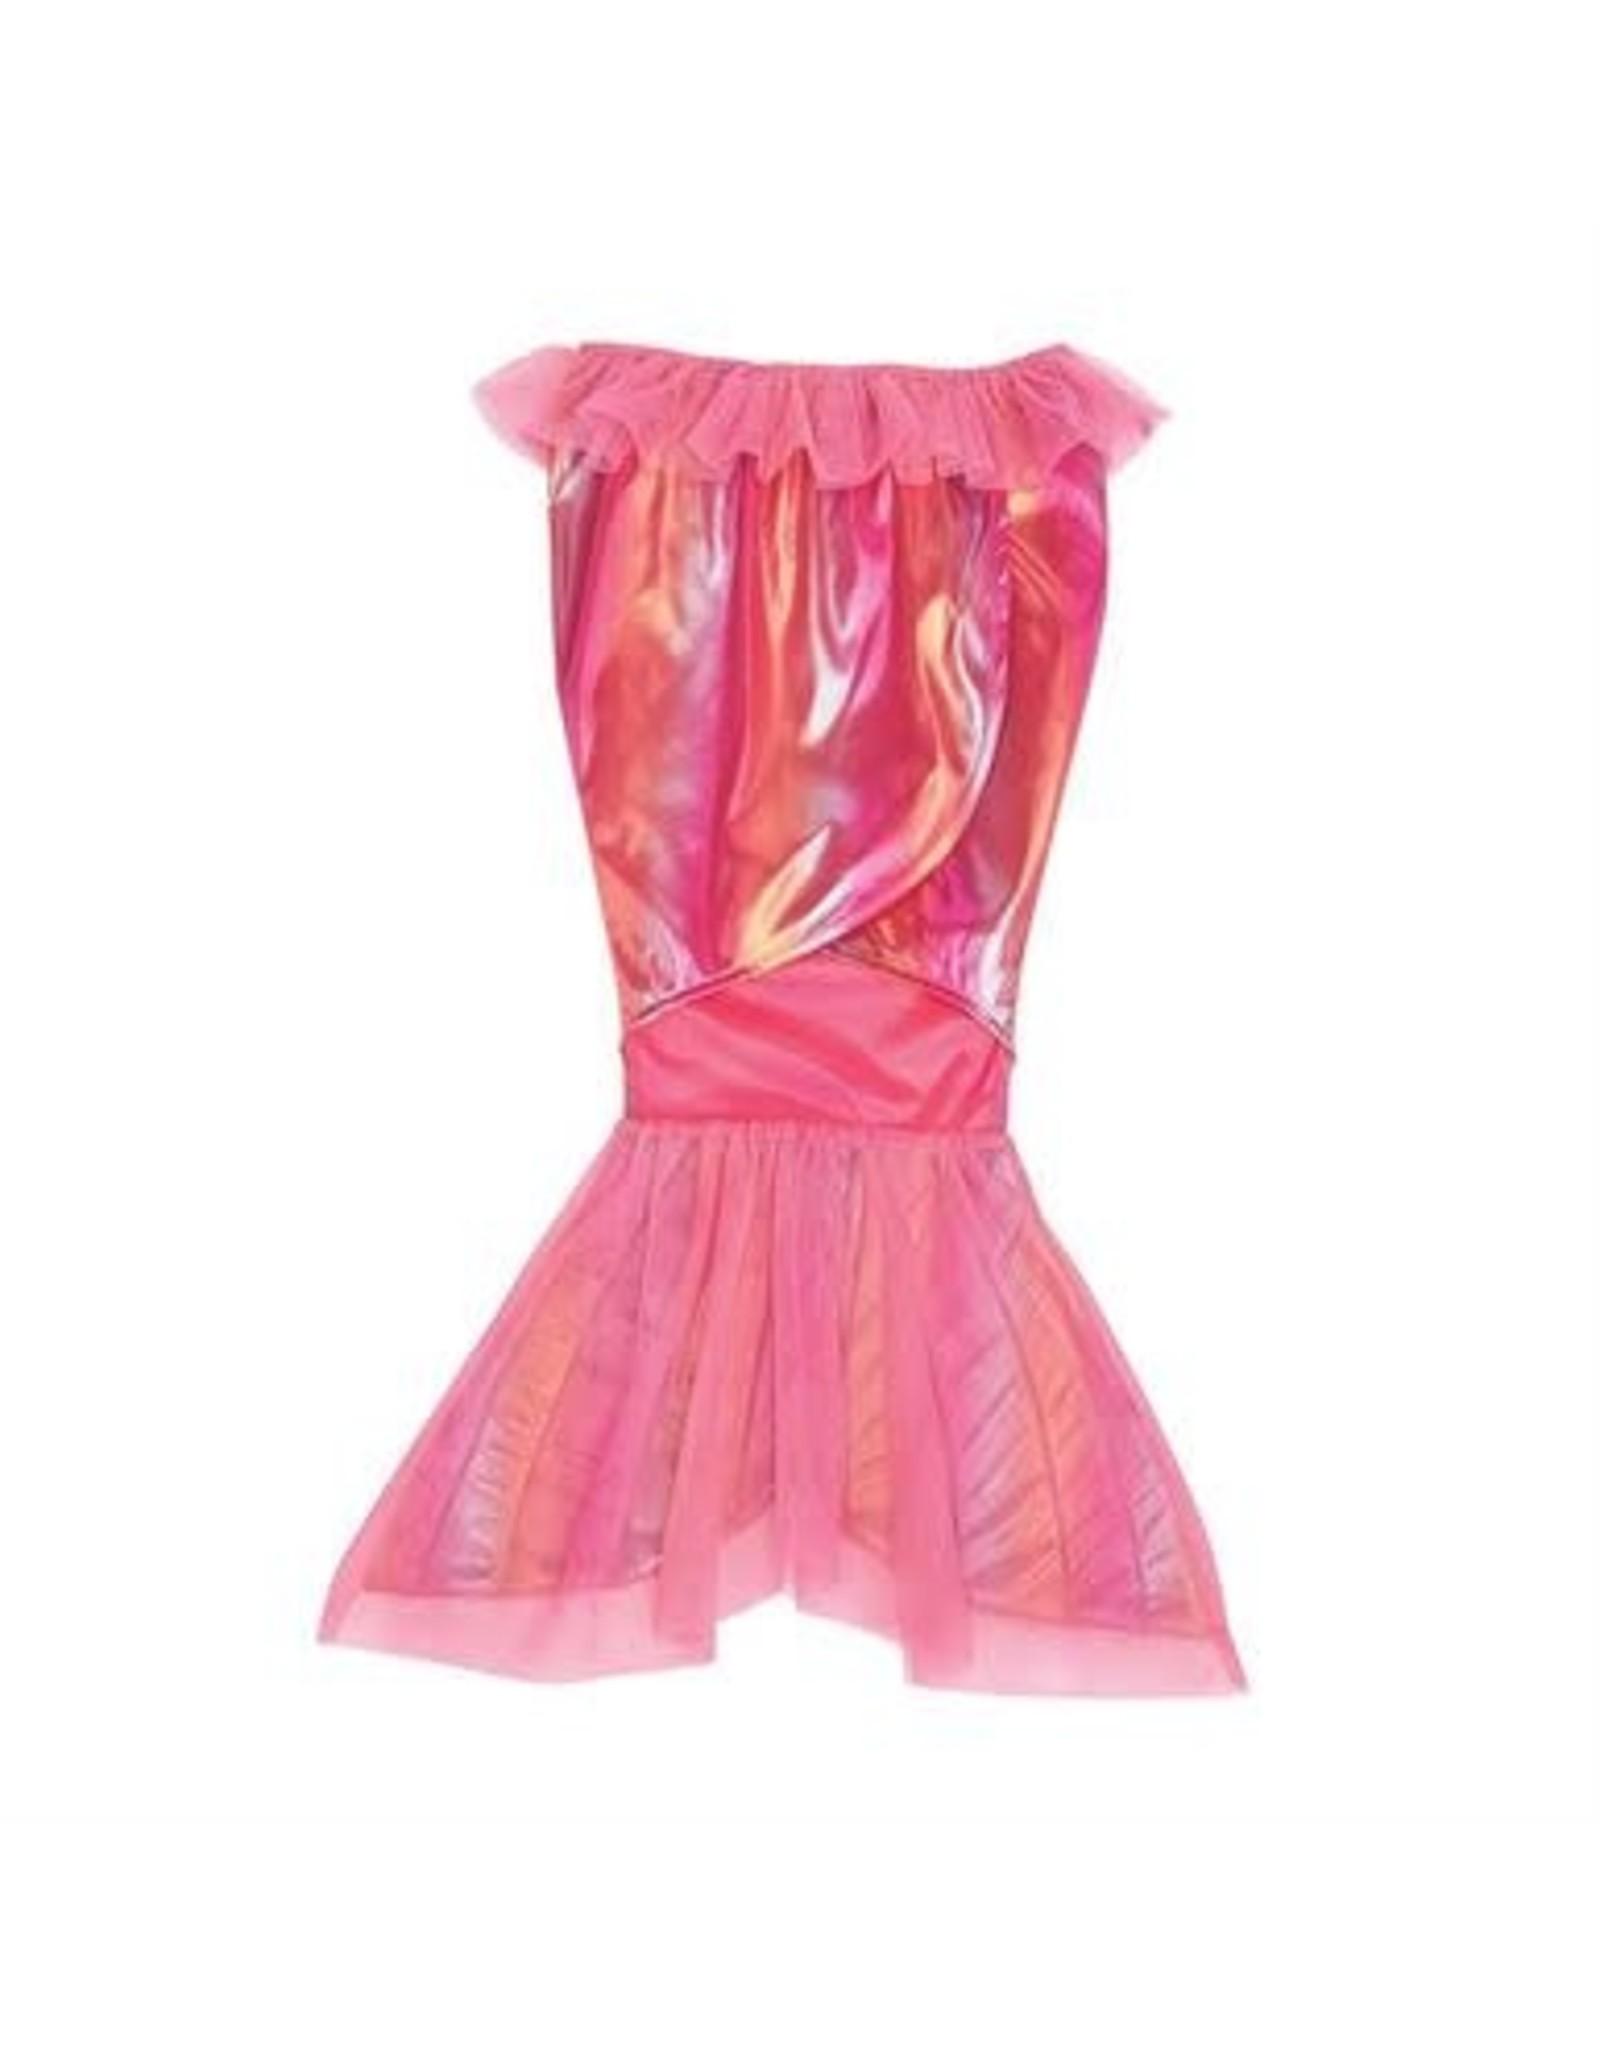 Mud Pie Dress Up Mermaid Tail-Pink